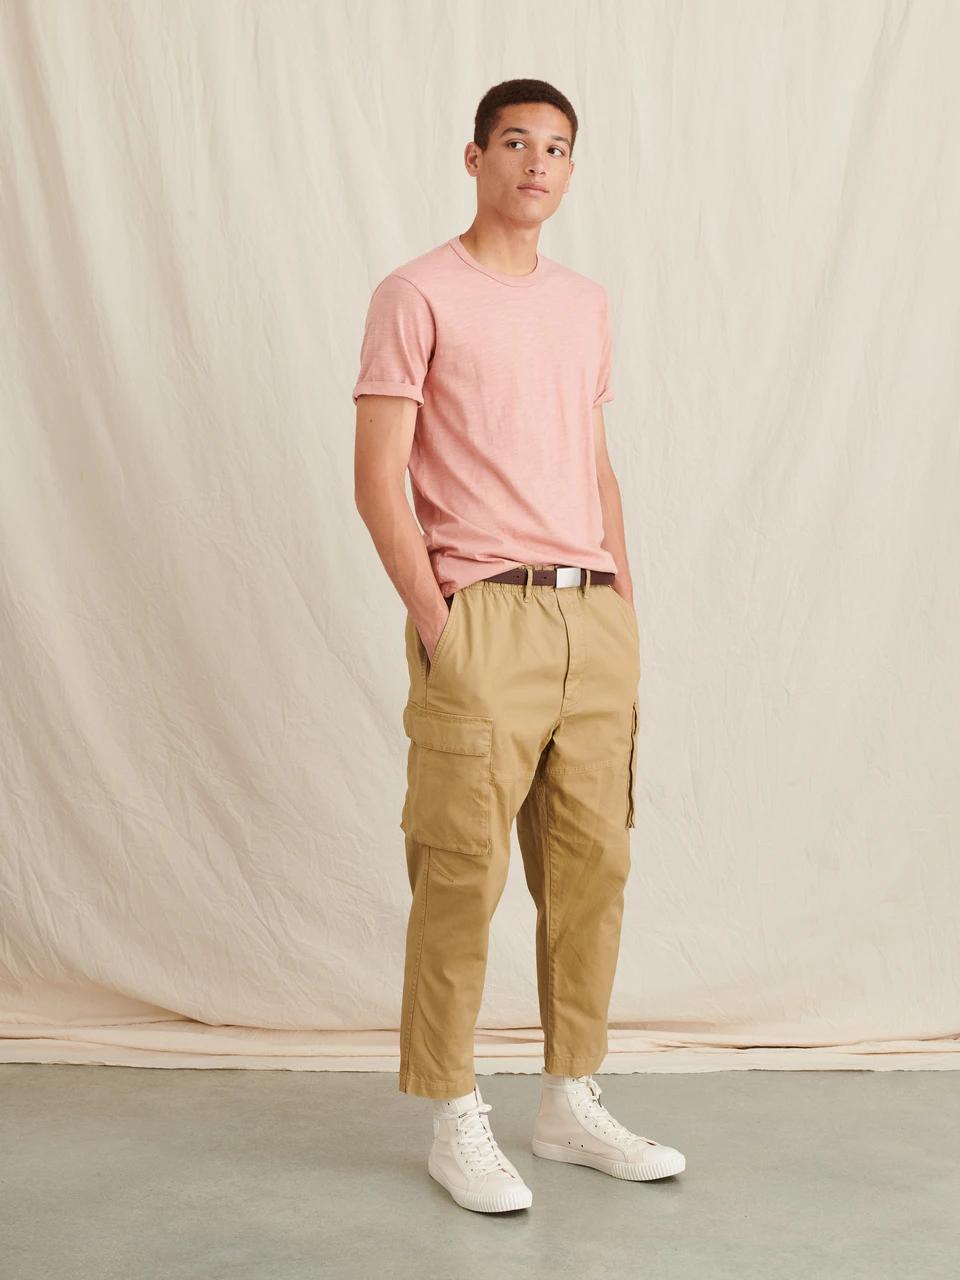 City Cargo Pant Alex Mill Mens Outfits Khaki Pants Outfit Men Pants Outfit Men [ 1280 x 960 Pixel ]